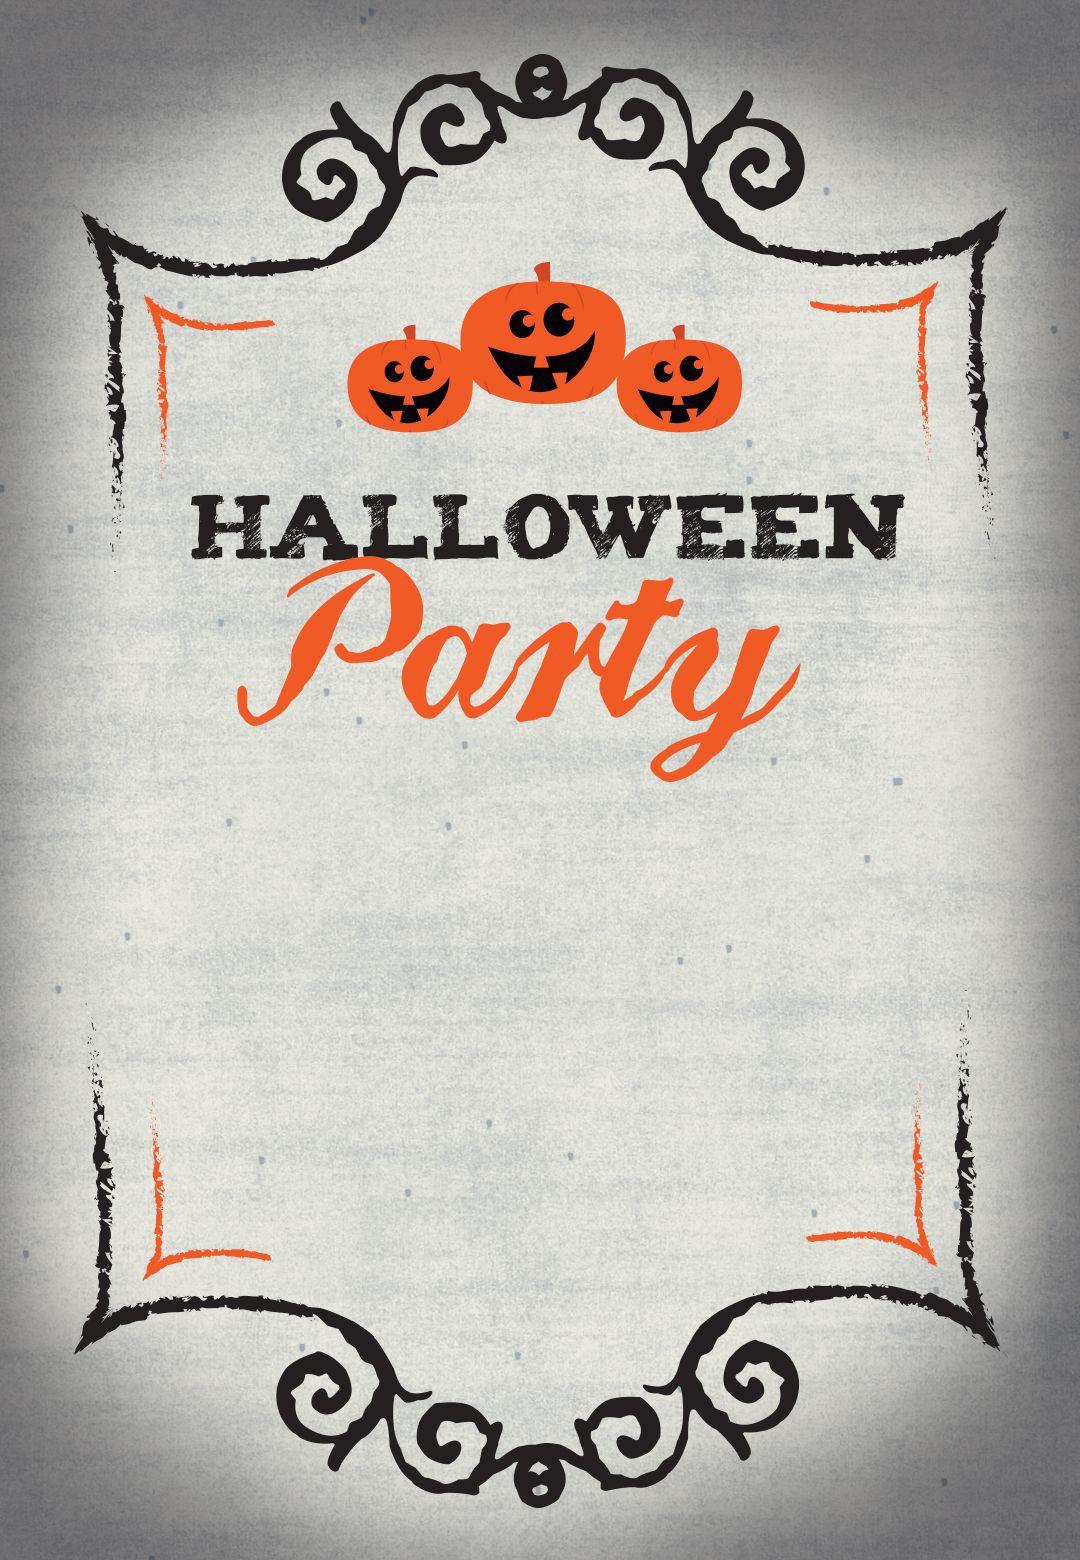 007 Incredible Free Halloween Invitation Template Example  Templates Microsoft Word Wedding Printable PartyFull